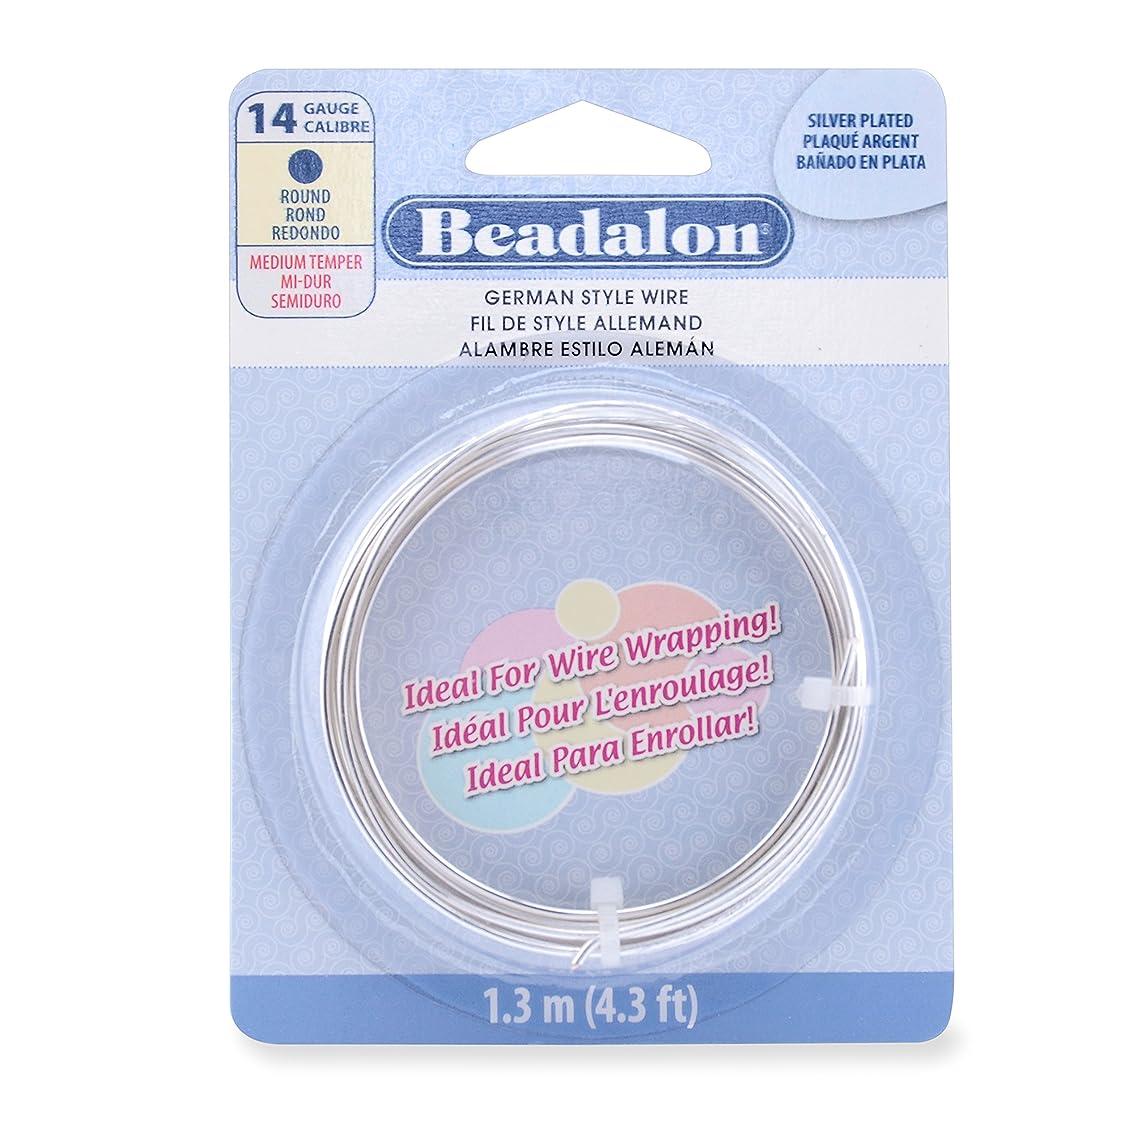 Beadalon German Style Wire, Round, Silver Plated, 14 Gauge, 1.3 Meters